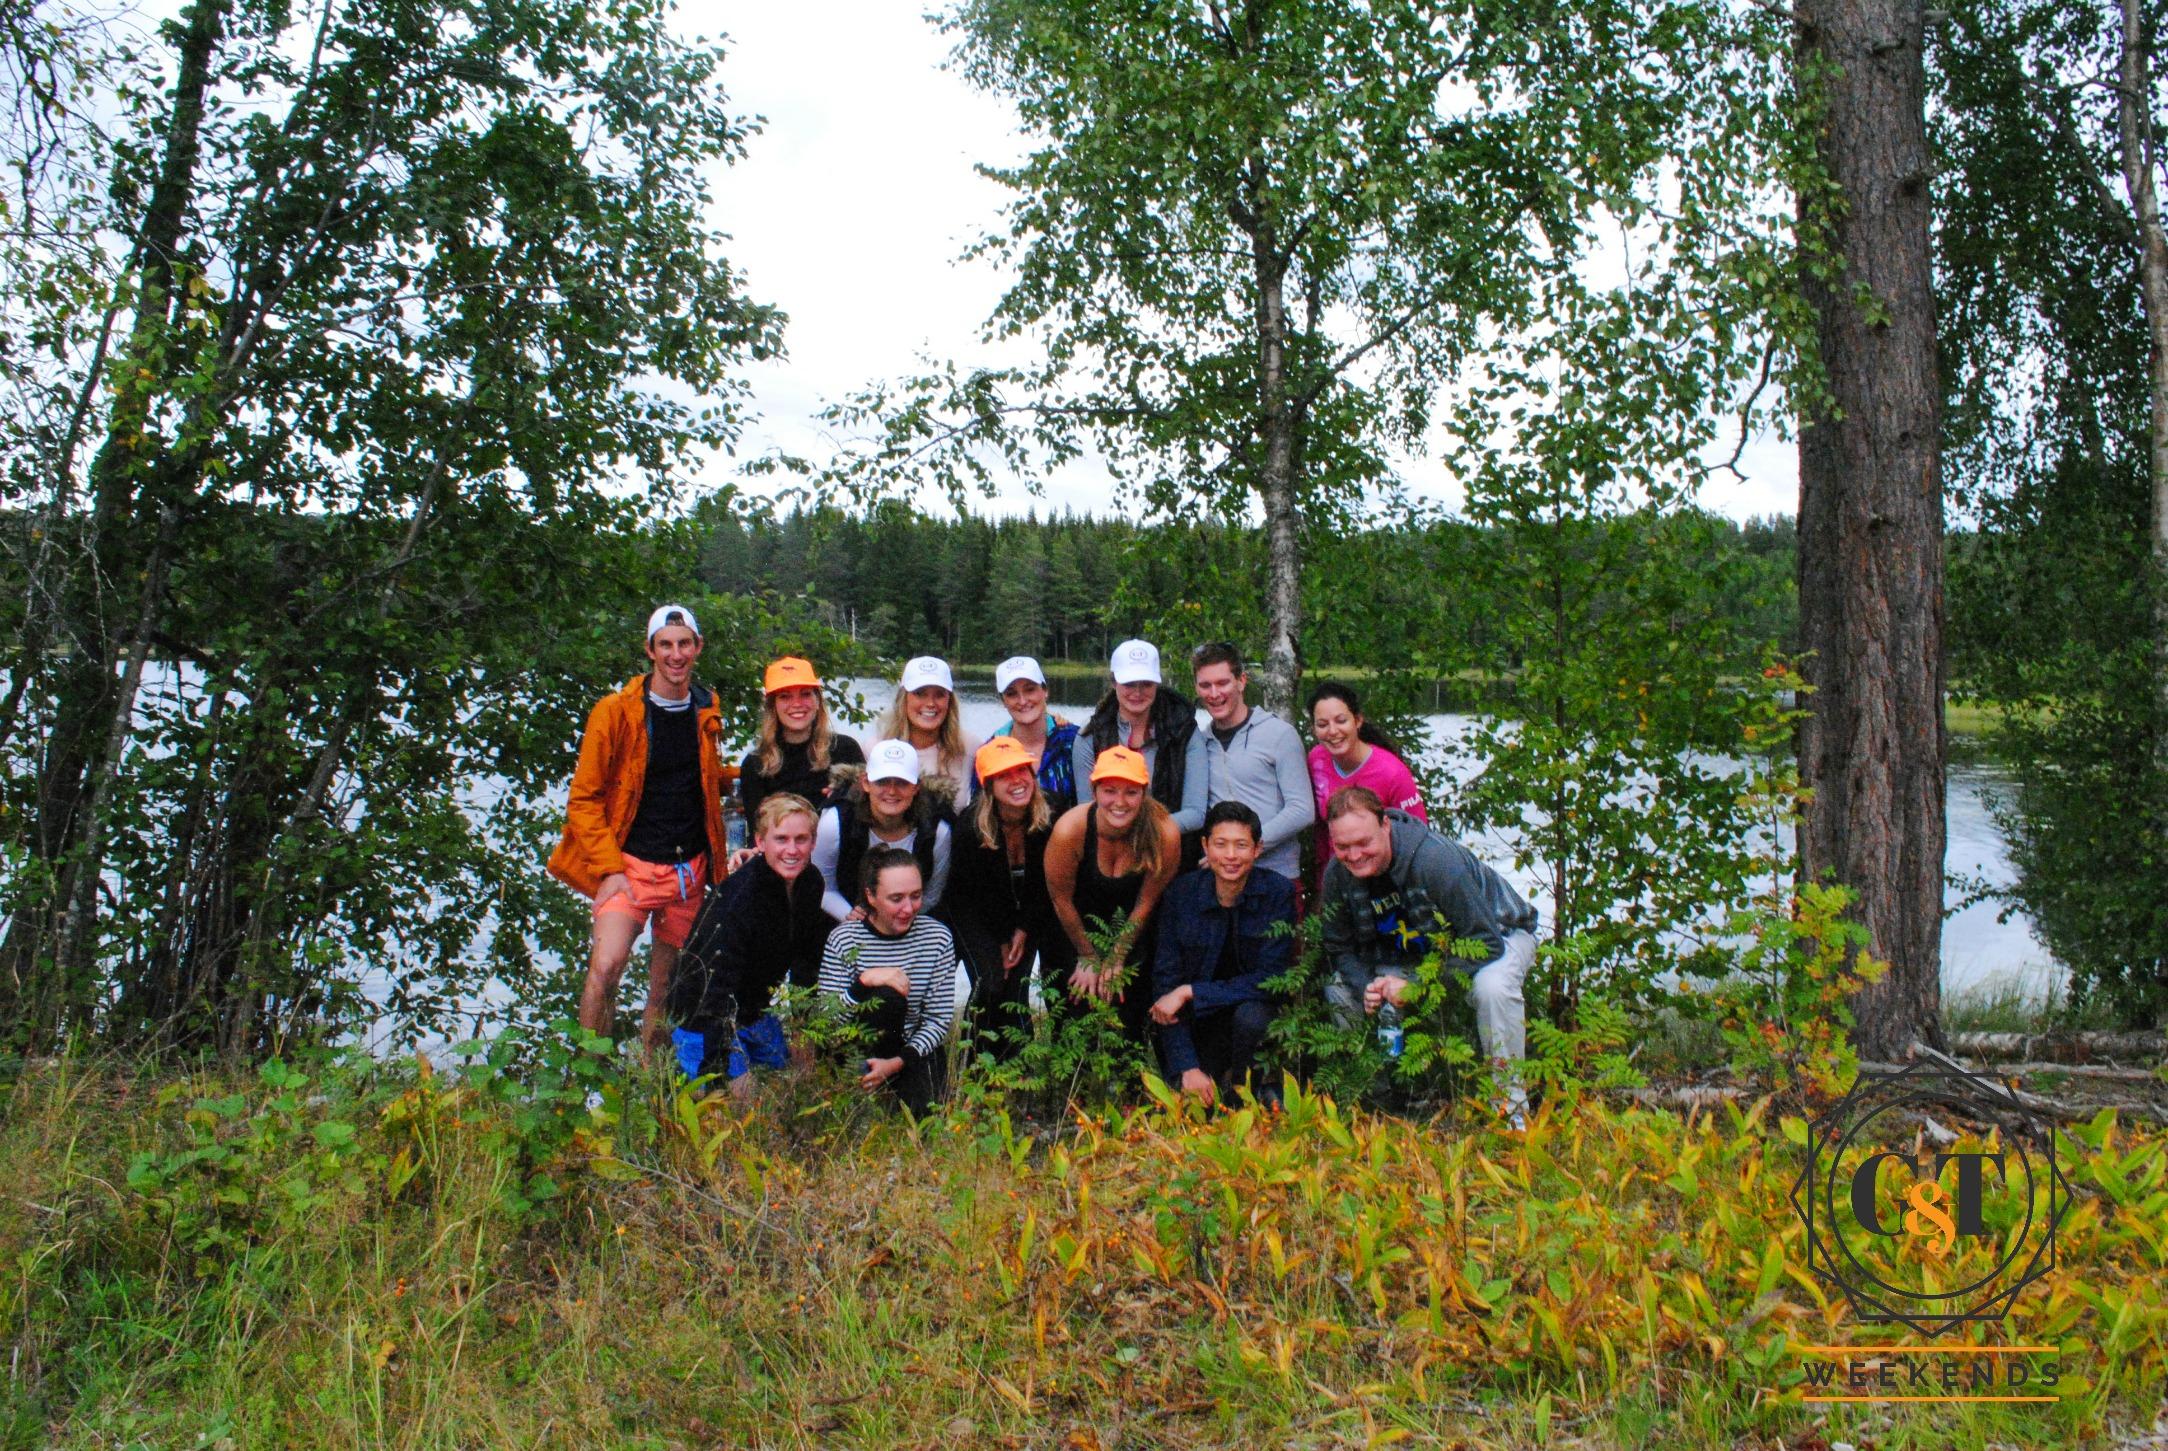 Hiking near Lake Skidden in Sweden